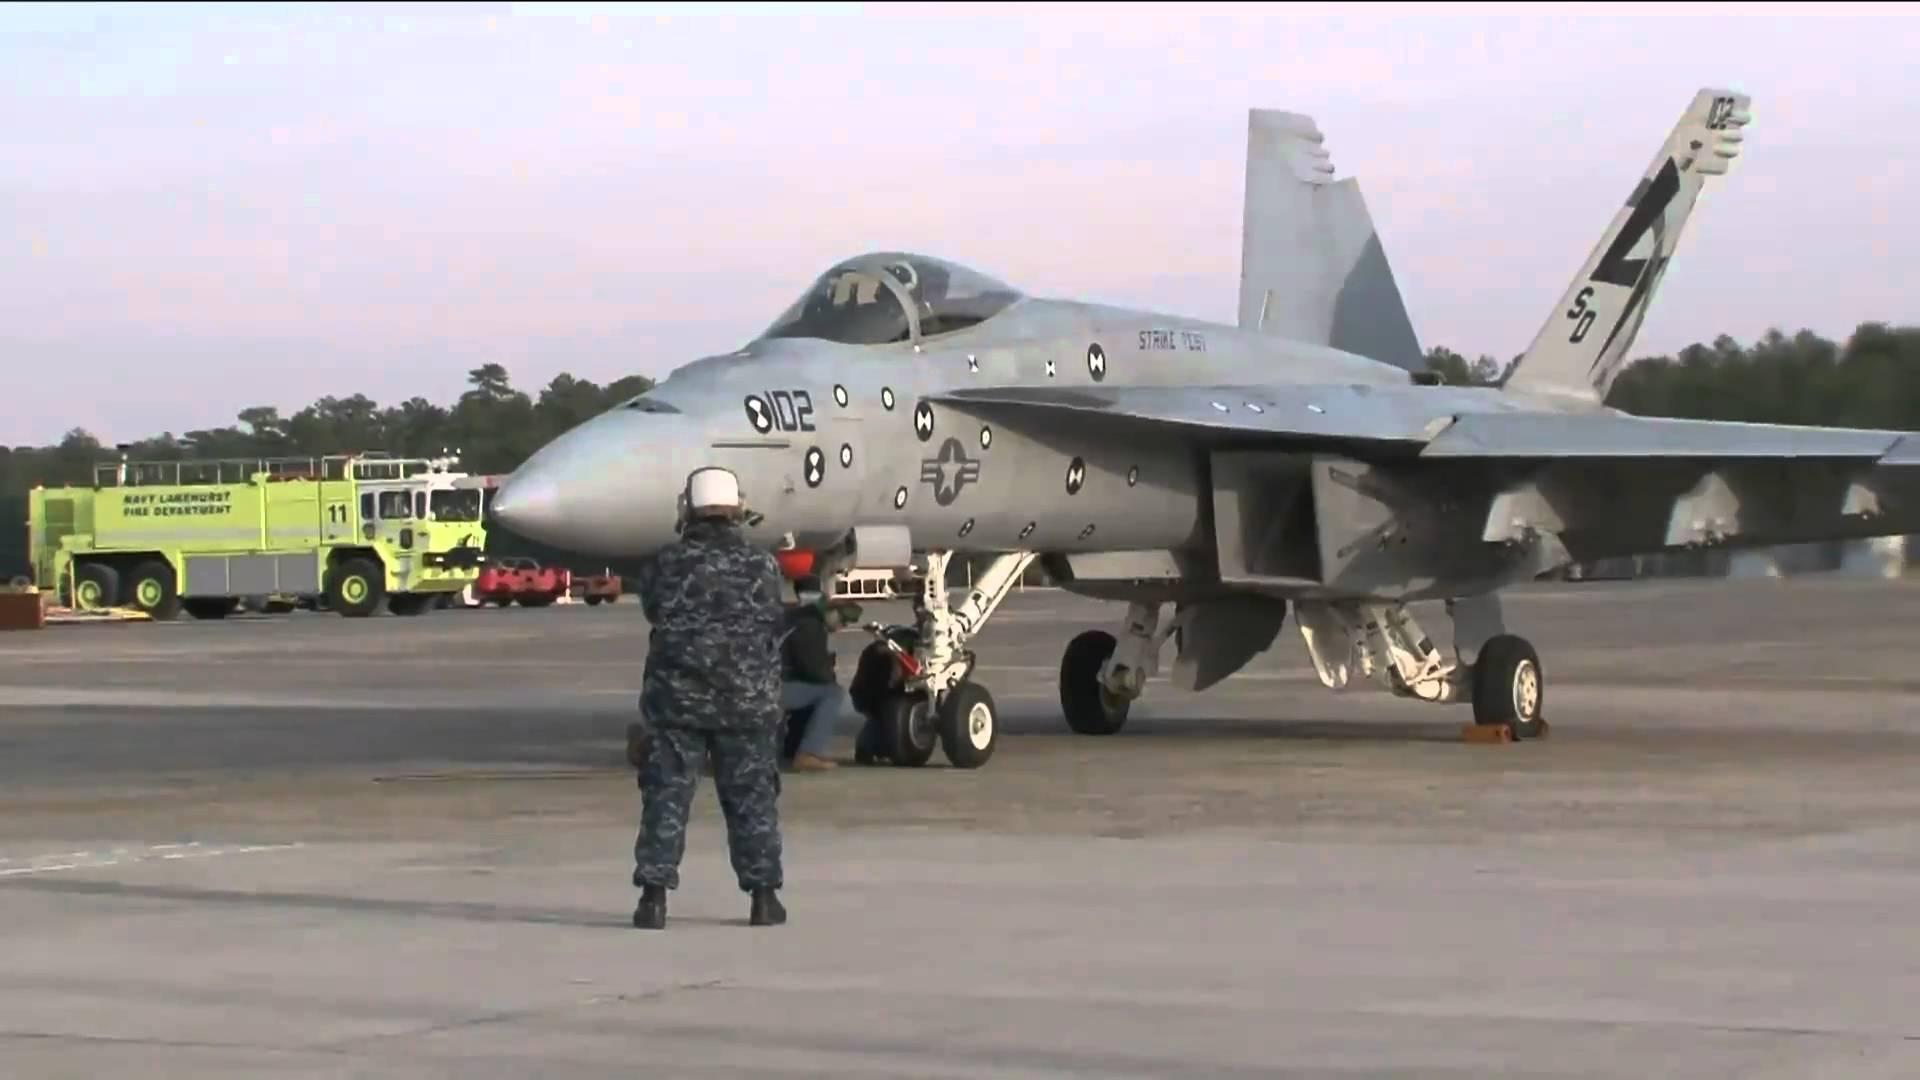 Aircraft launch photo